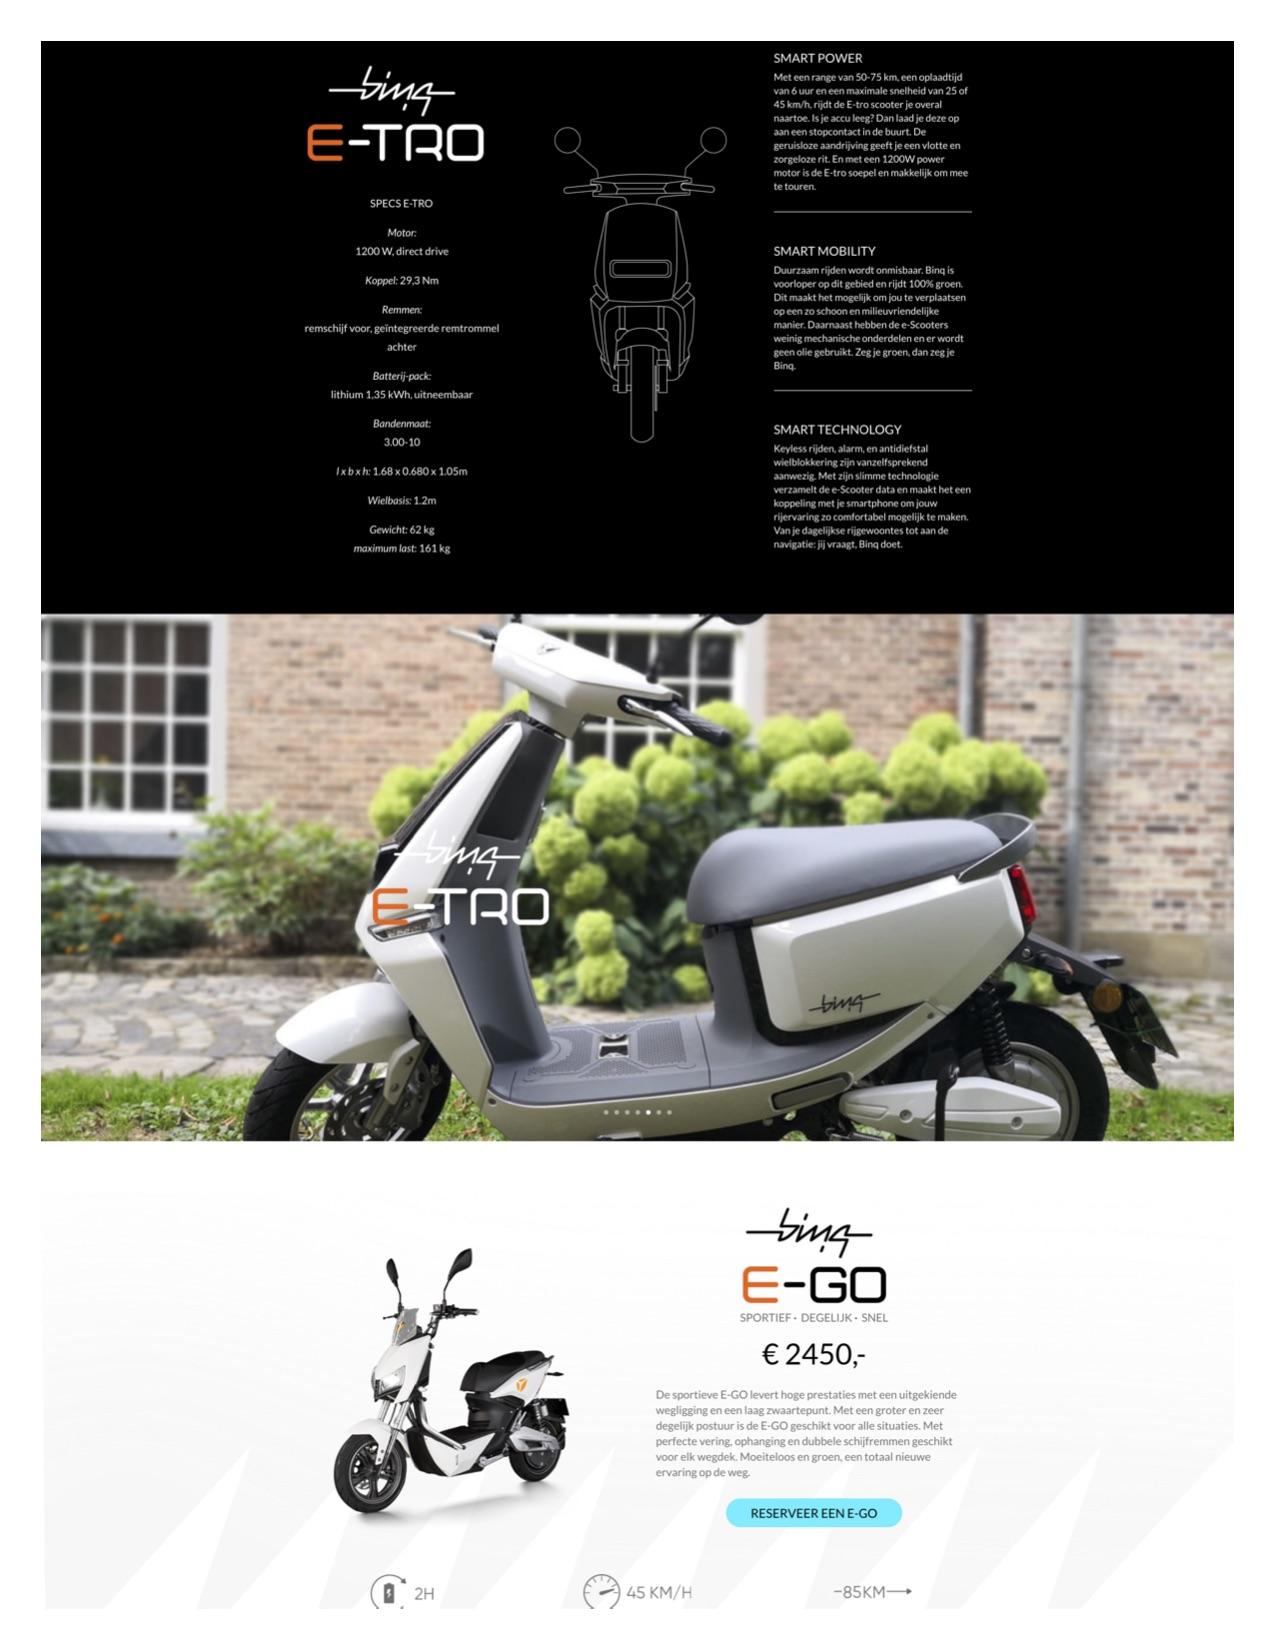 Binq-scooters-02